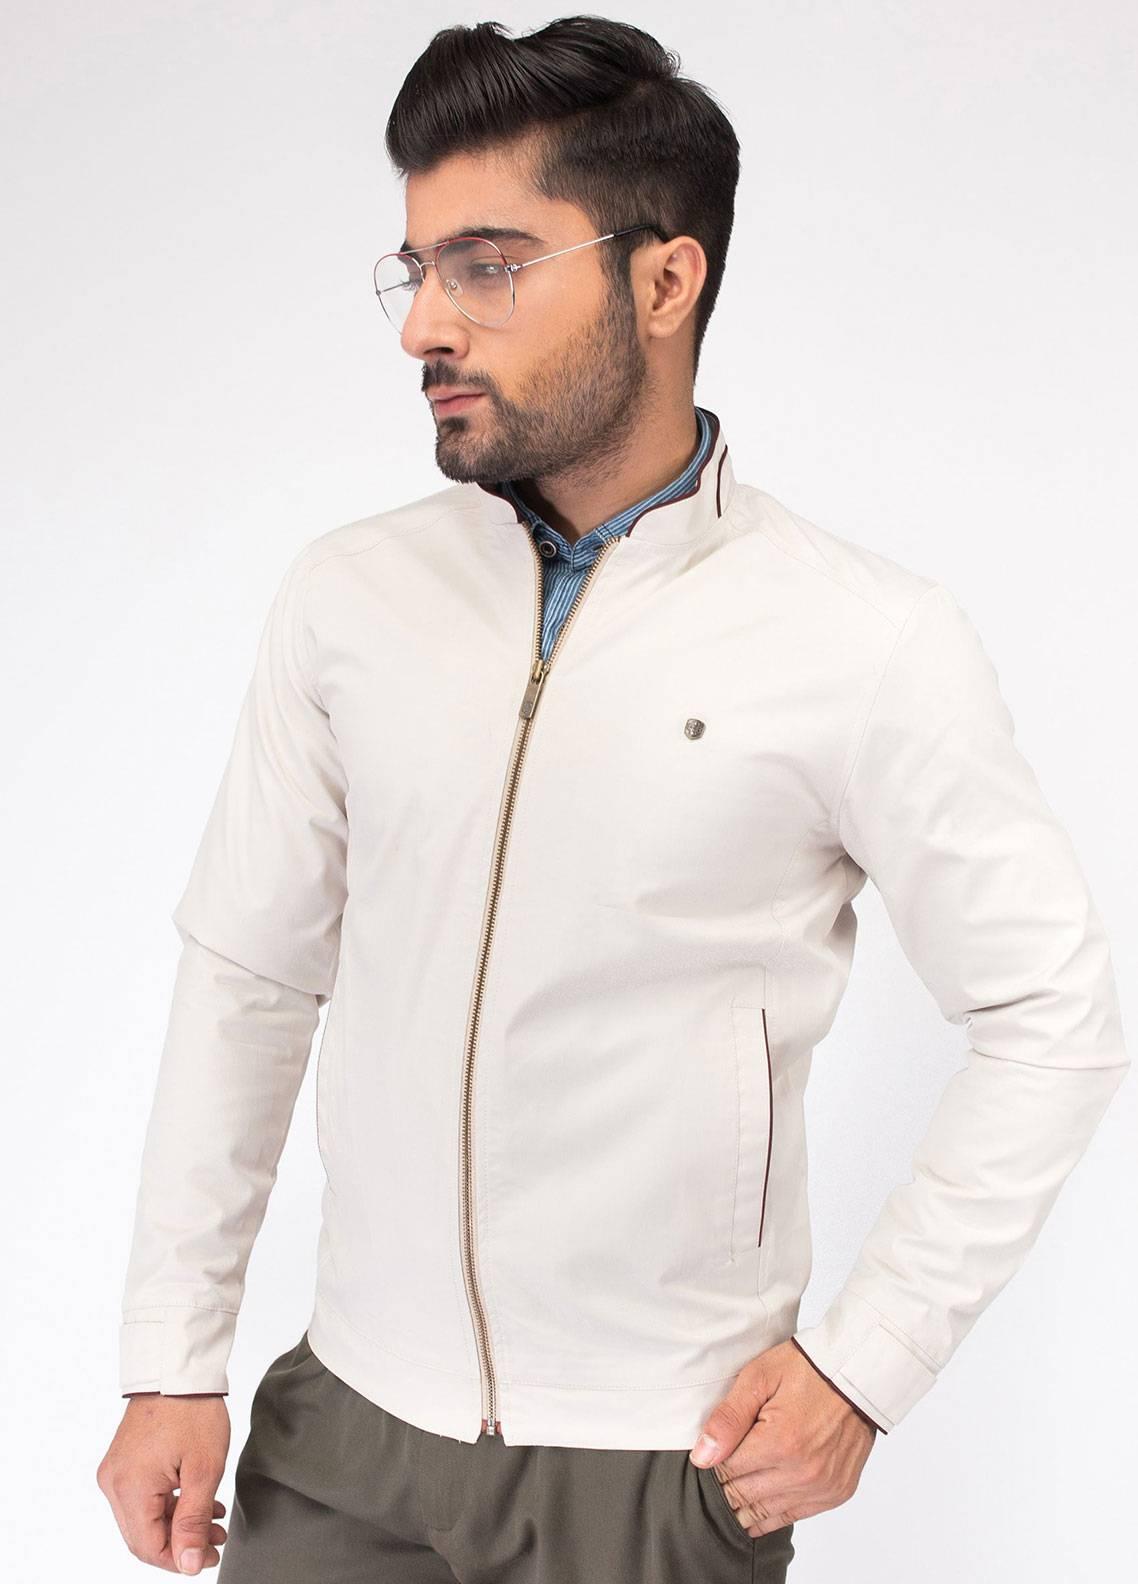 Brumano Cotton Full Sleeves Jackets for Men - White BRM-11-741